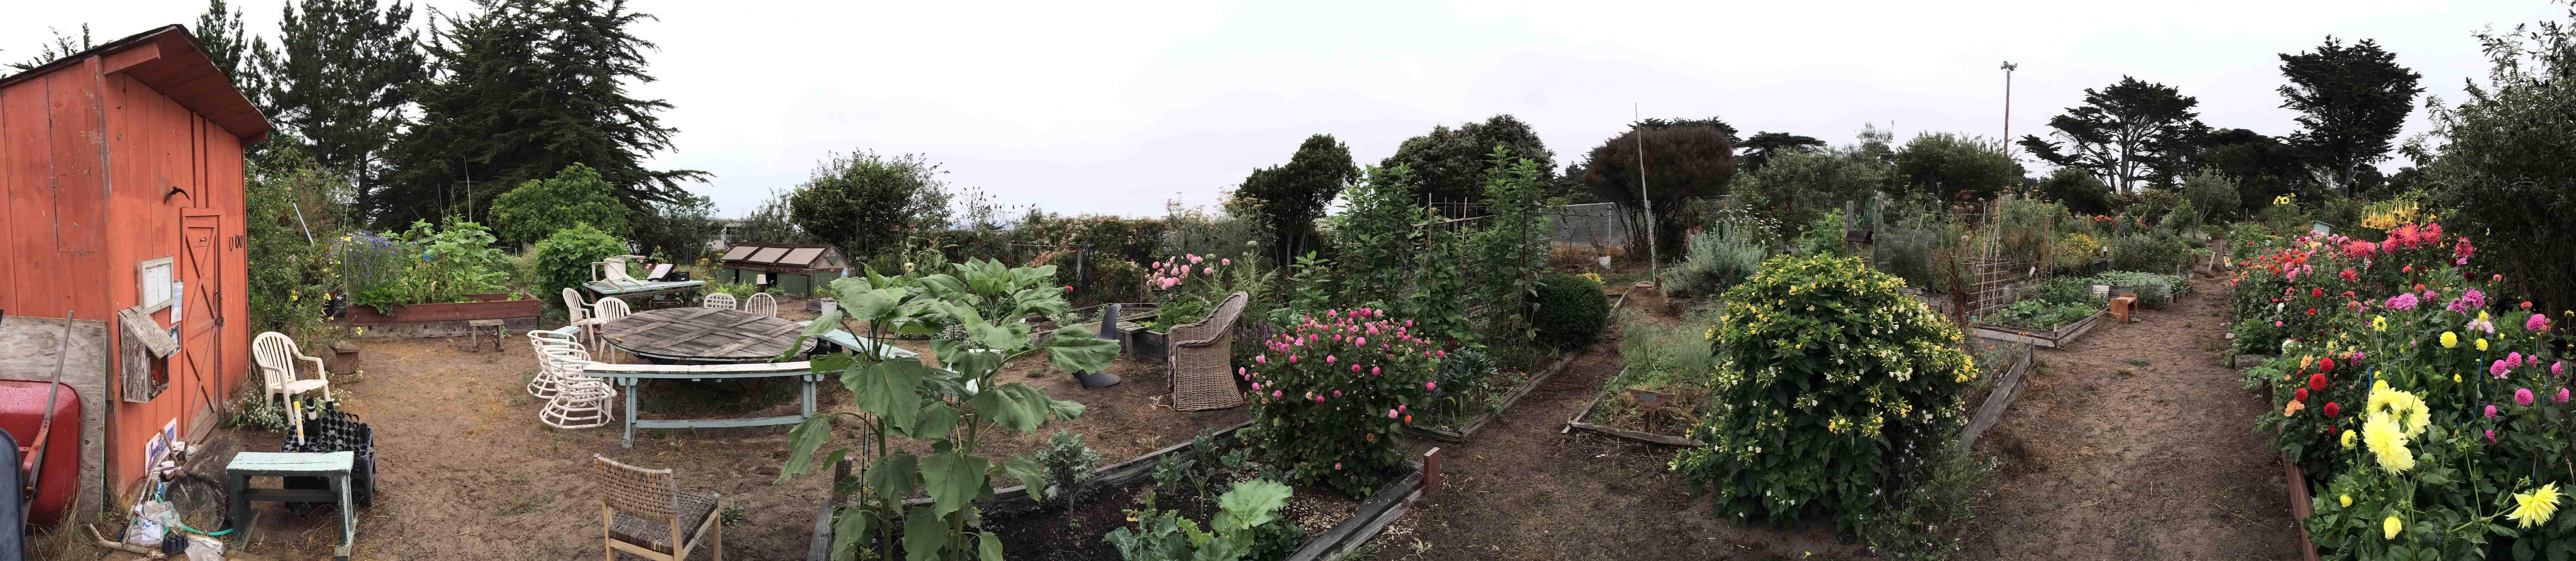 Sunset_Community_Garden_Pano_(Small).jpg